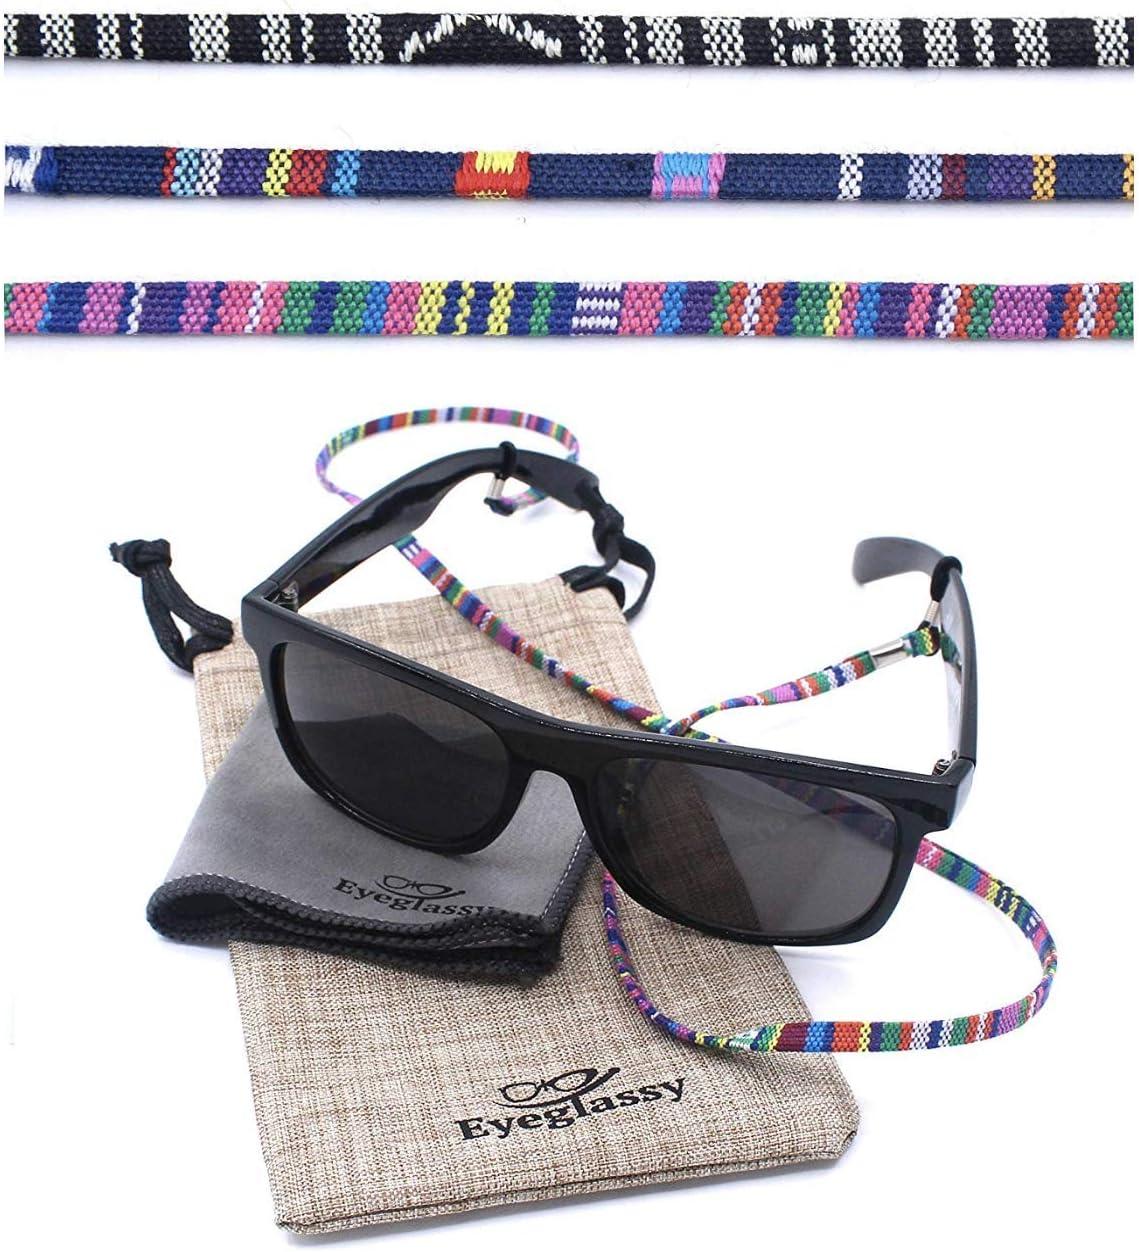 Sunglass Straps – Eyewear Retainer [Pack of 3 + Bonuses] - Eyeglass Holder, Chain, Cord, Necklace, Lanyard – Eyeglass Strap - Eyeglass Retainer - Eyewear Holder - Glasses Straps - Eyewear Holder